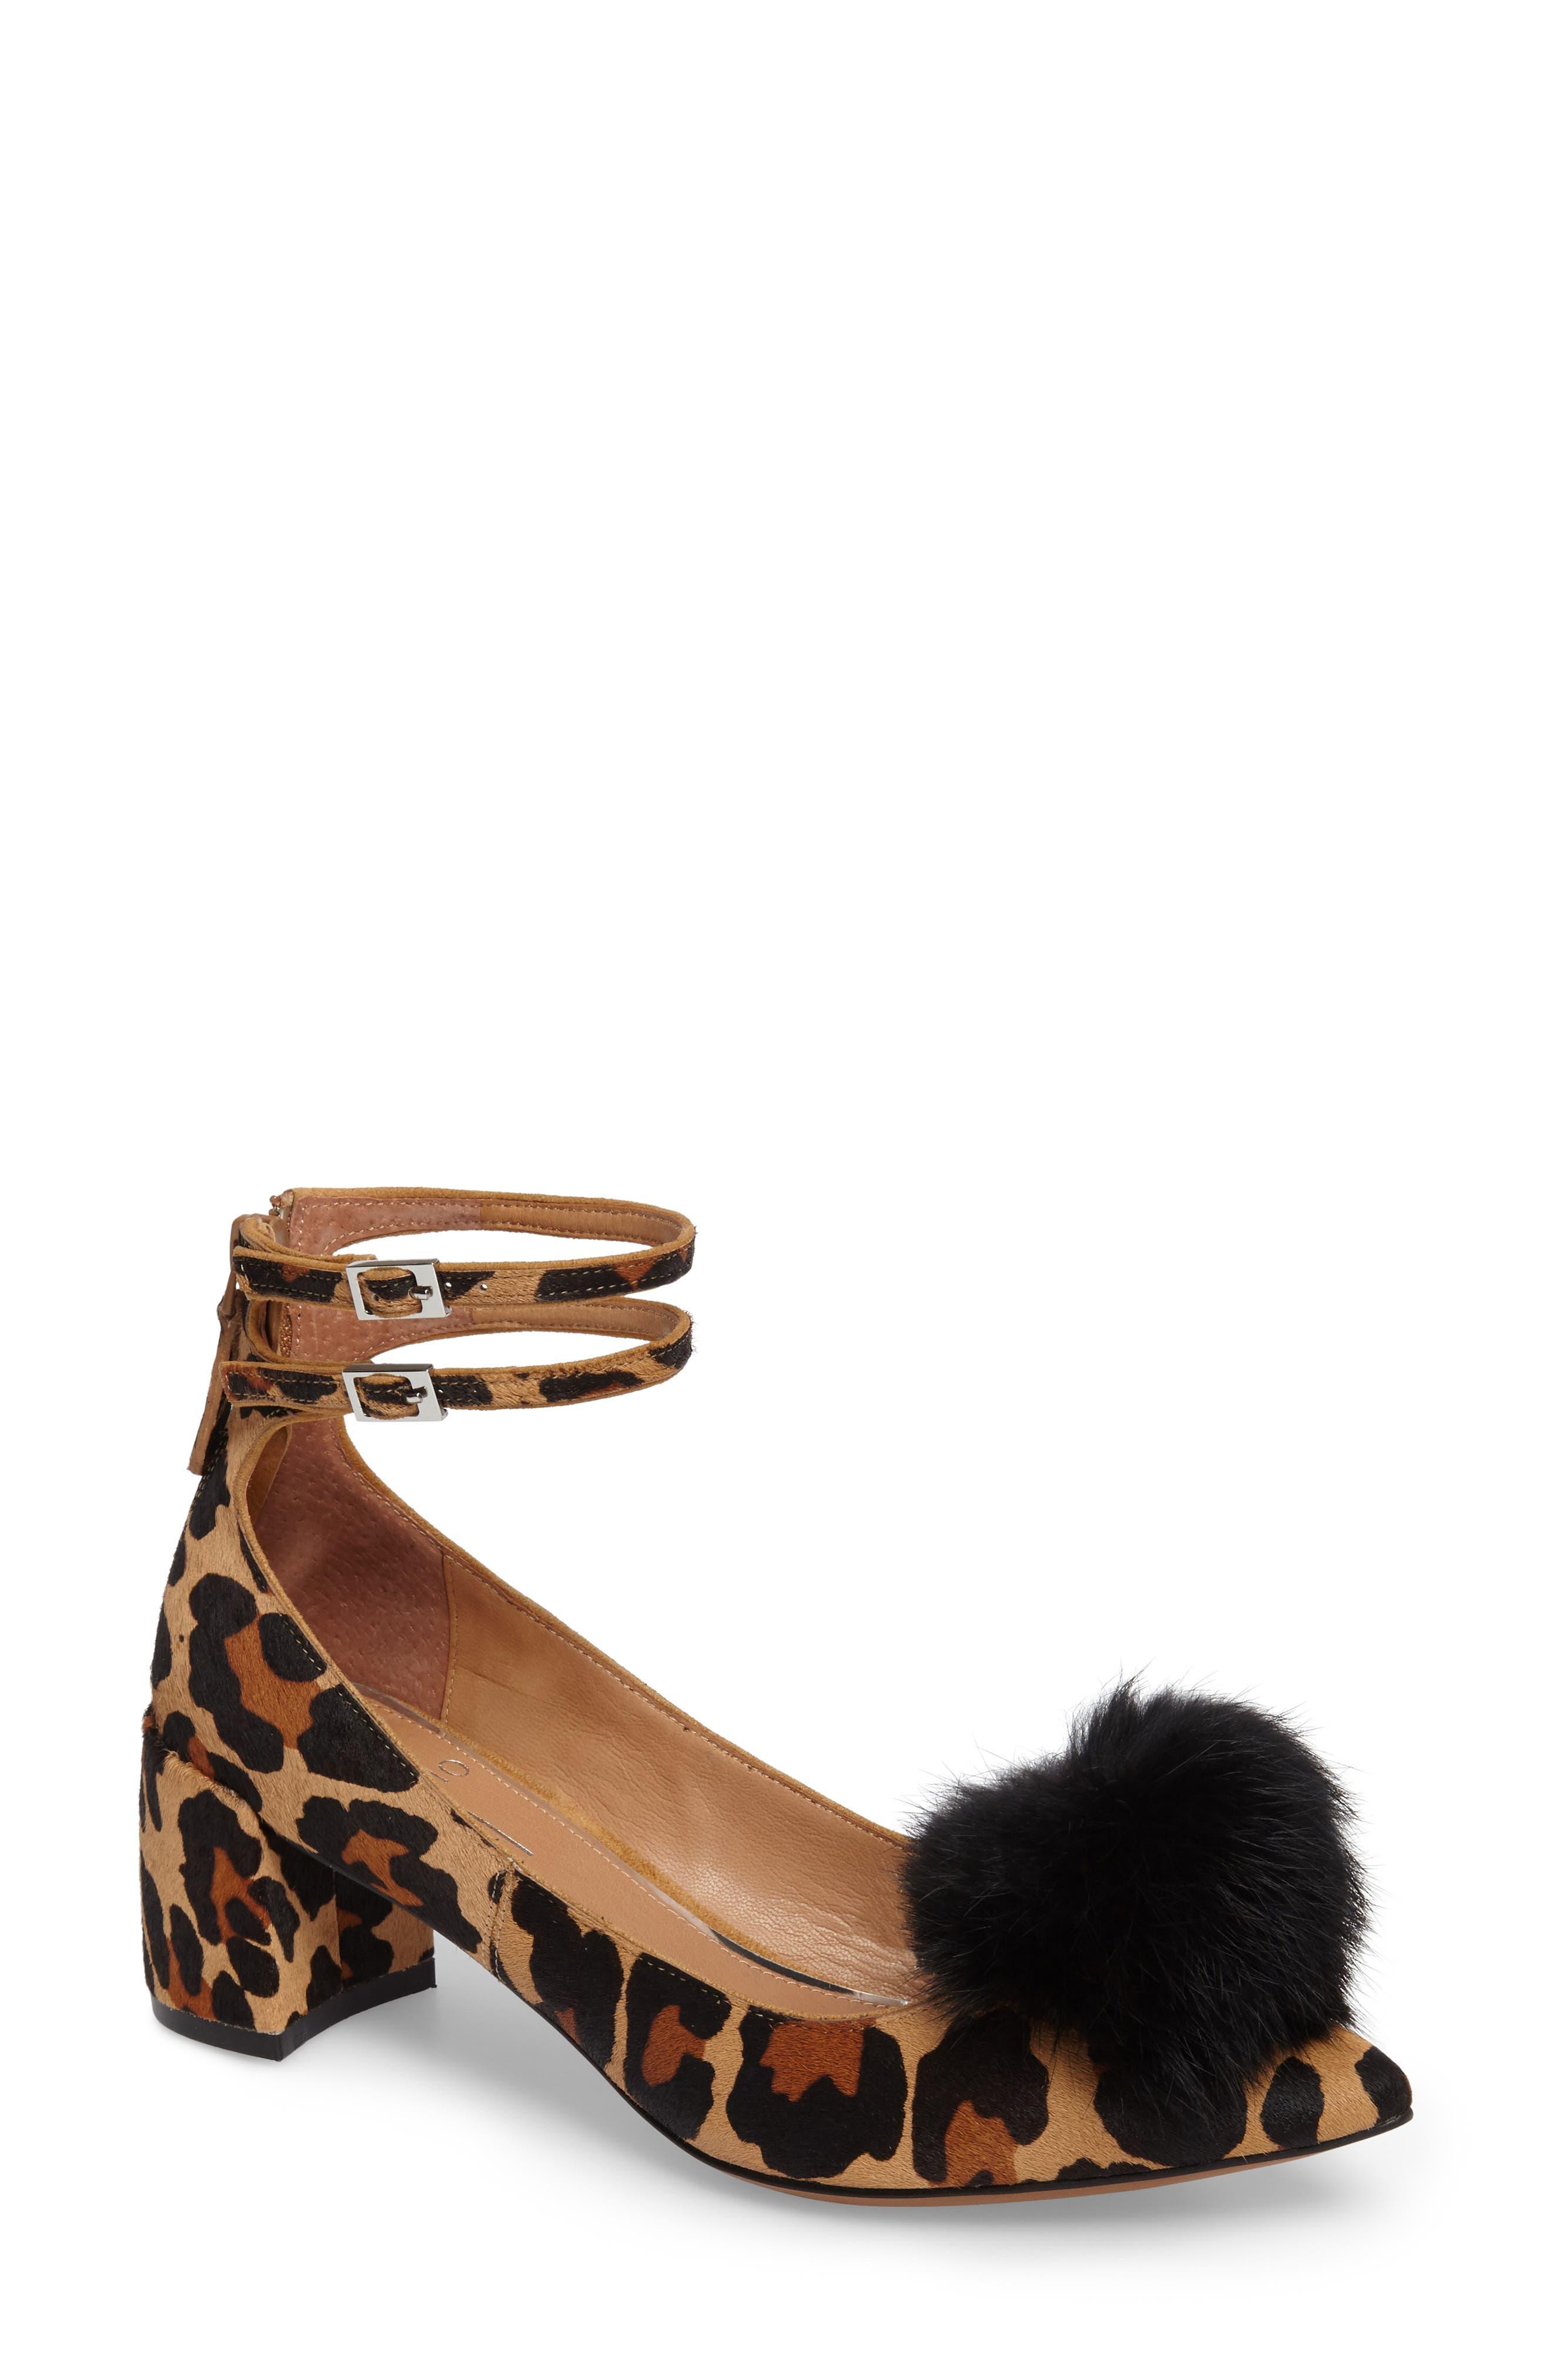 Nadine II Ankle Strap Pump,                         Main,                         color, Cognac Printed Calf Hair